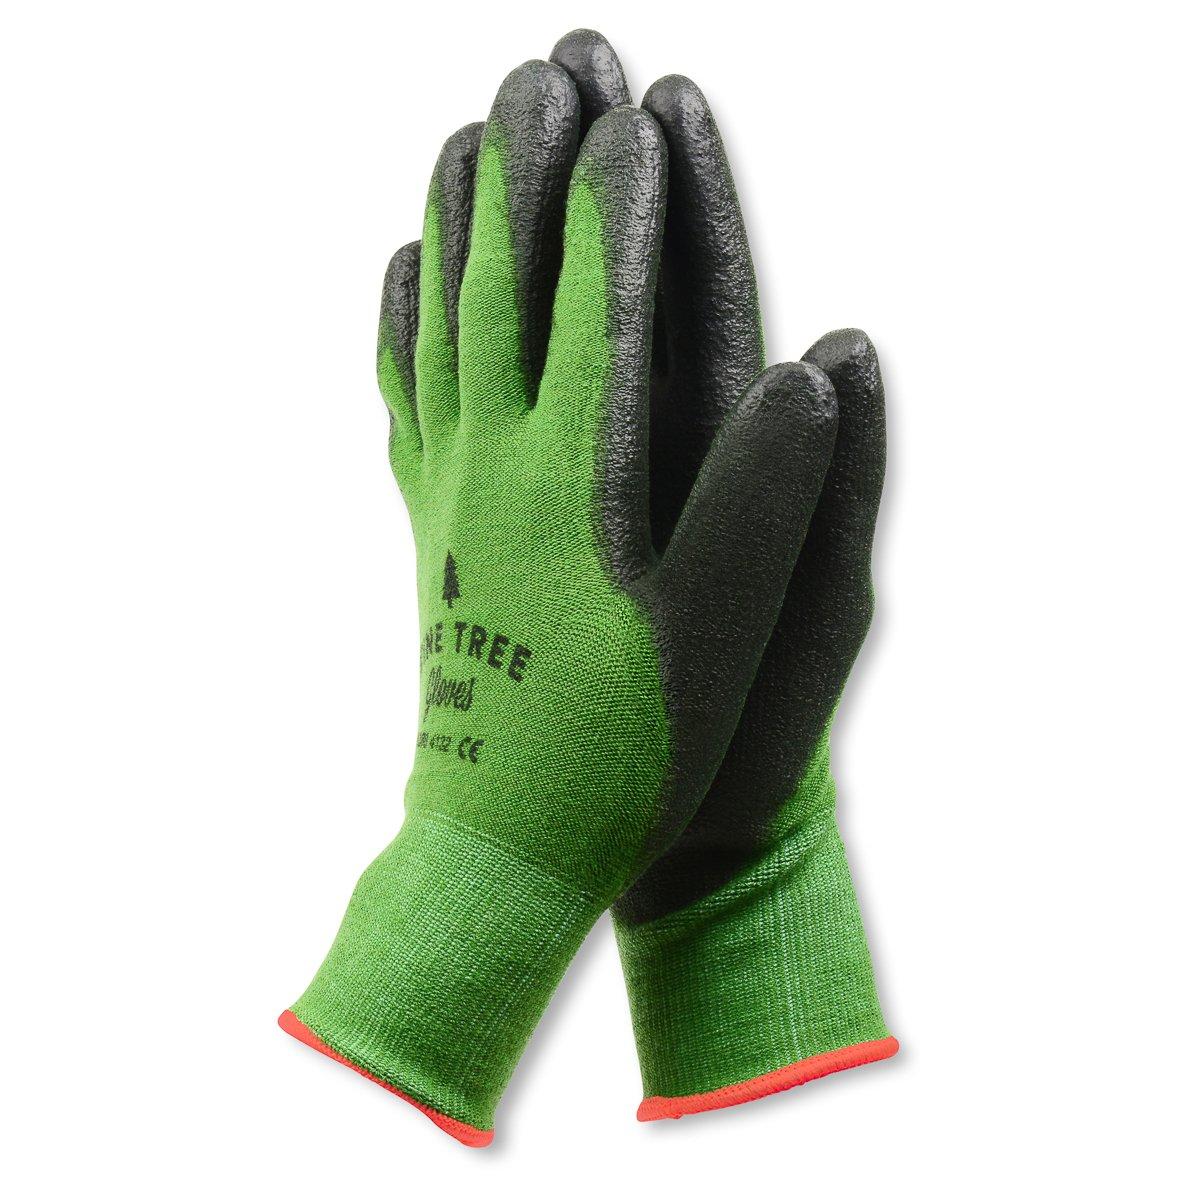 Bamboo work gardening gloves for women men protective for Gardening gloves ladies